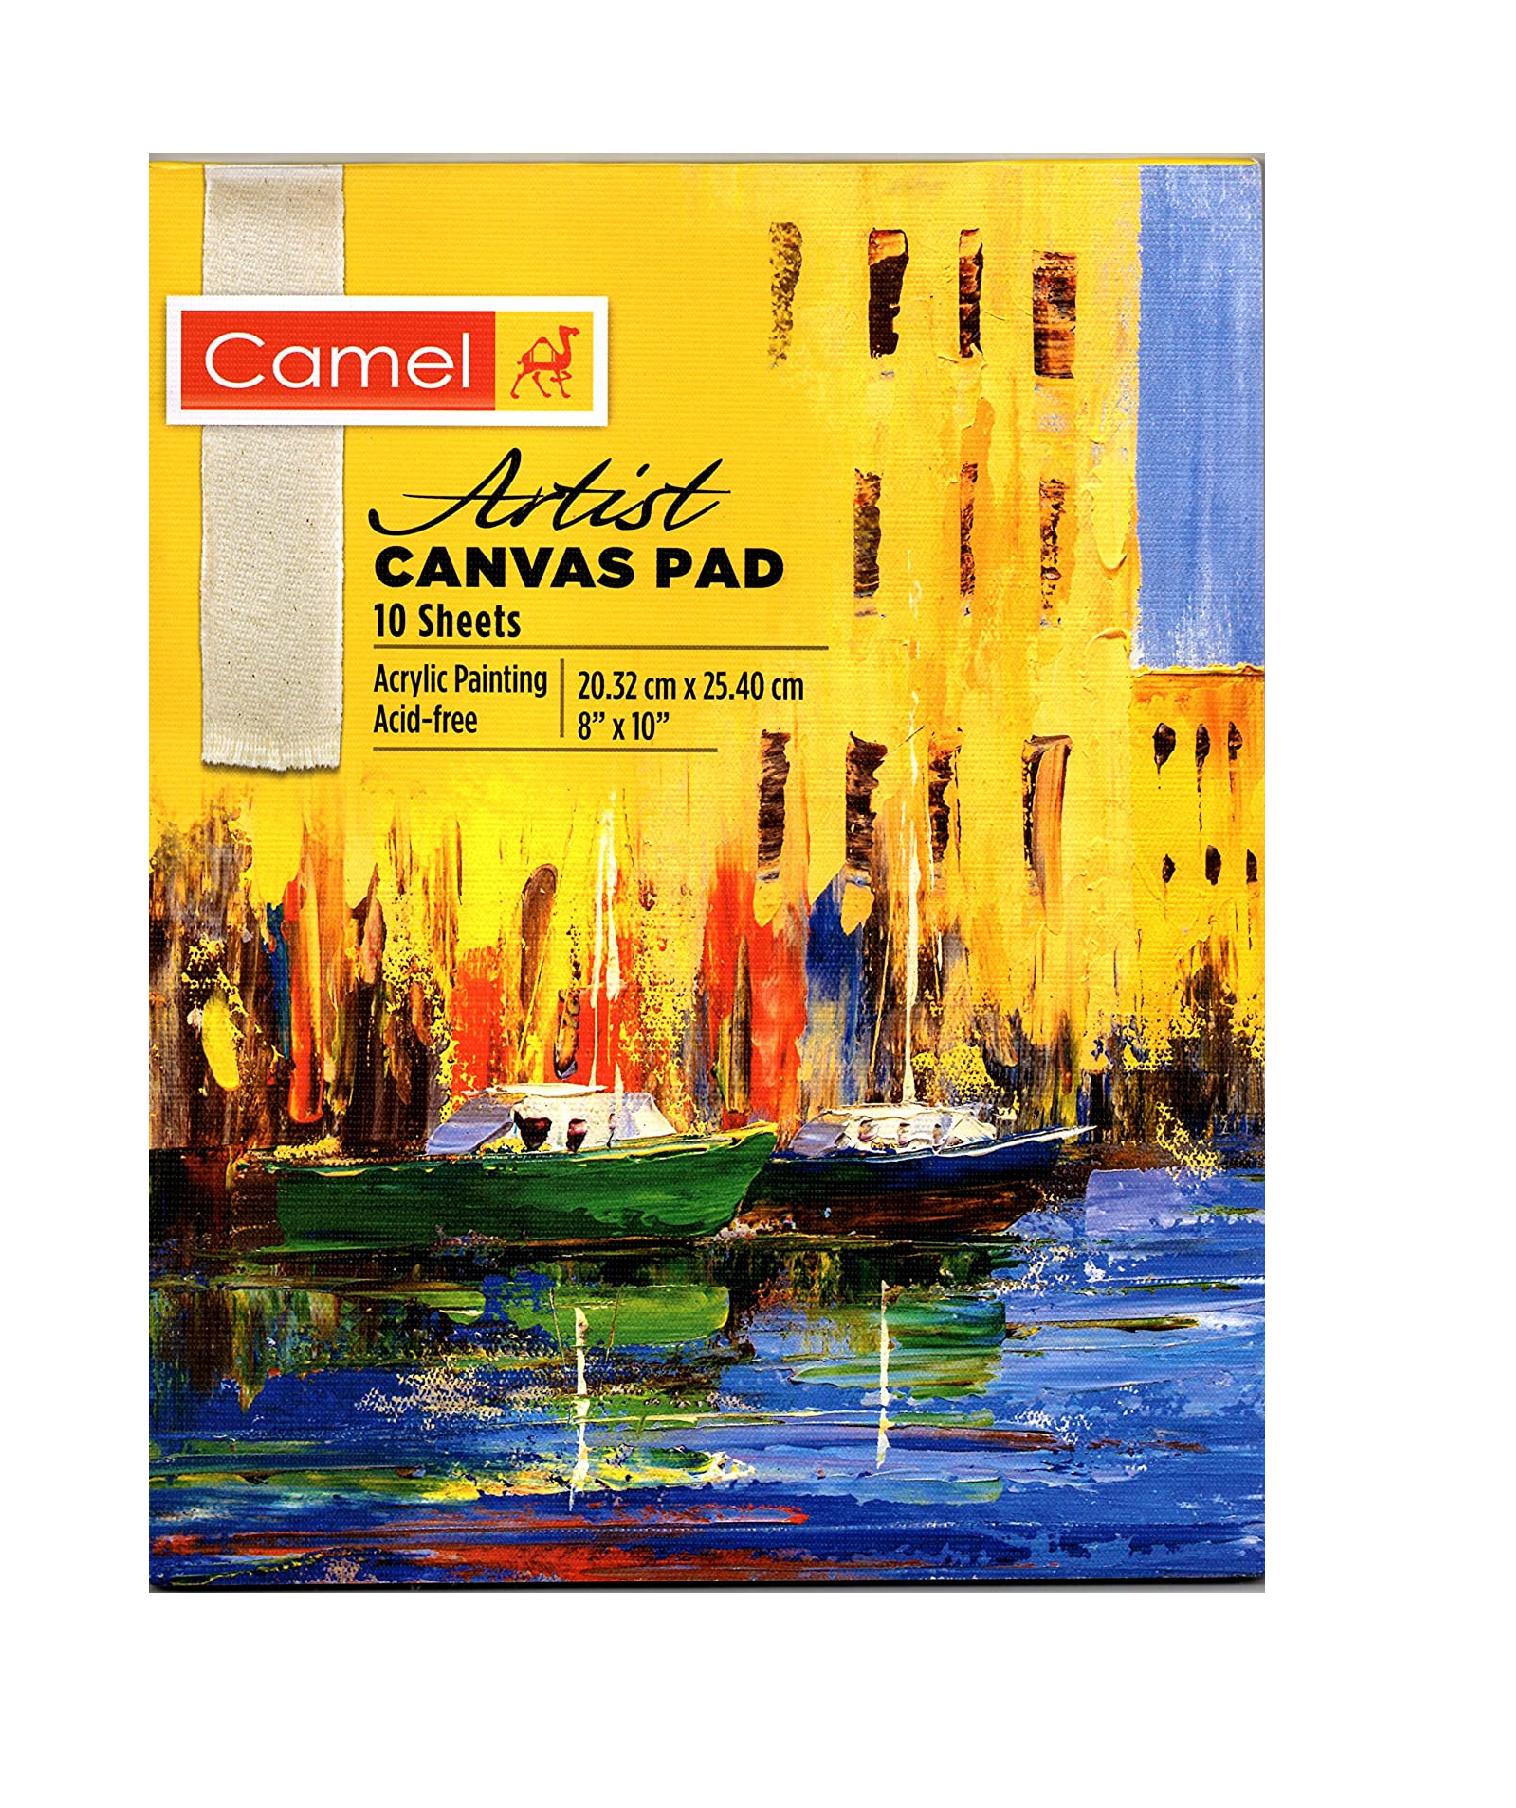 "Camel Artist Canvas PAD - 20cm x 25cm (8"" x 10"")"